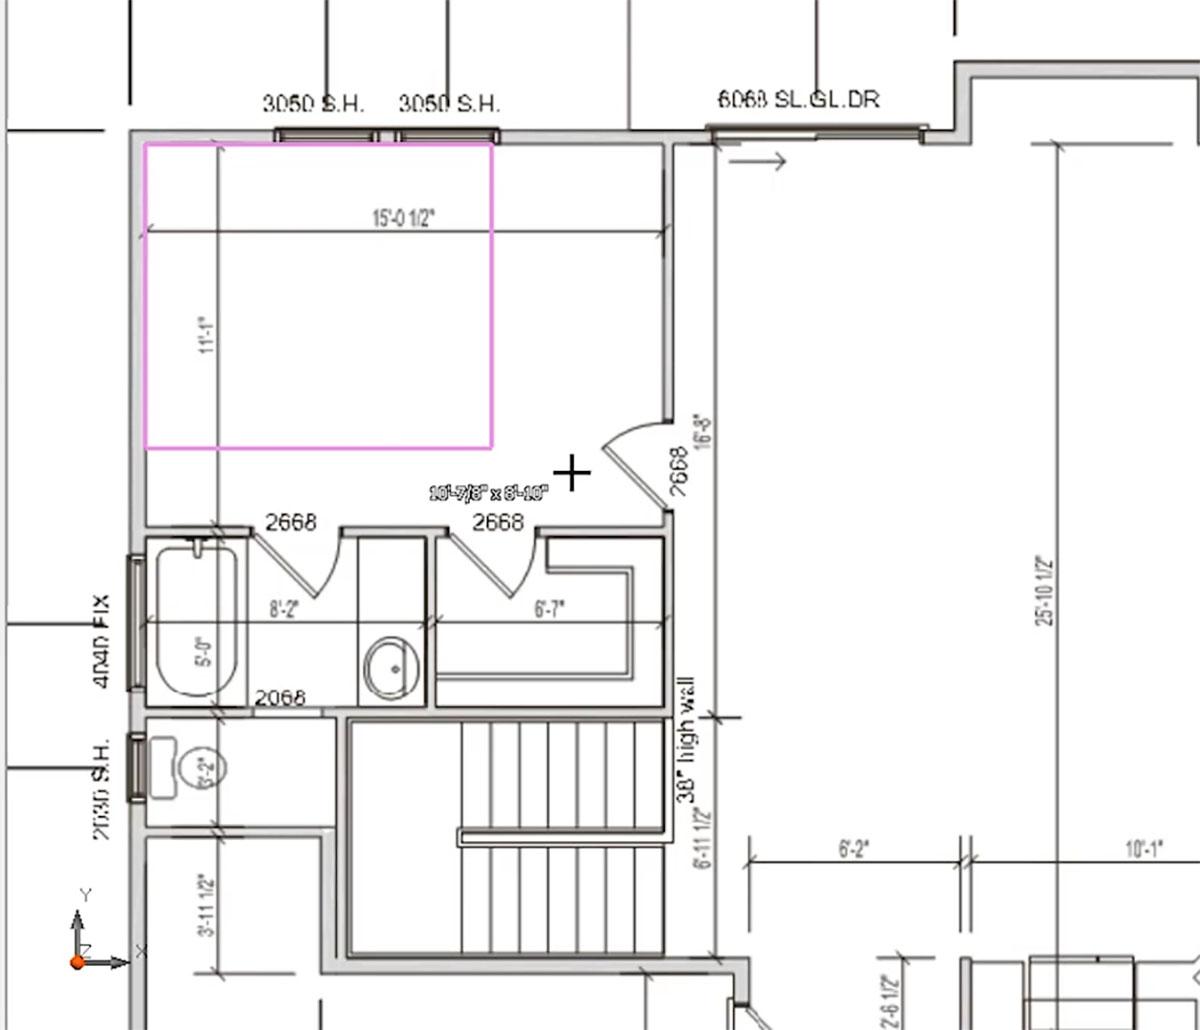 MiTek 2D Drafting Service - Portion of a 2D blueprint